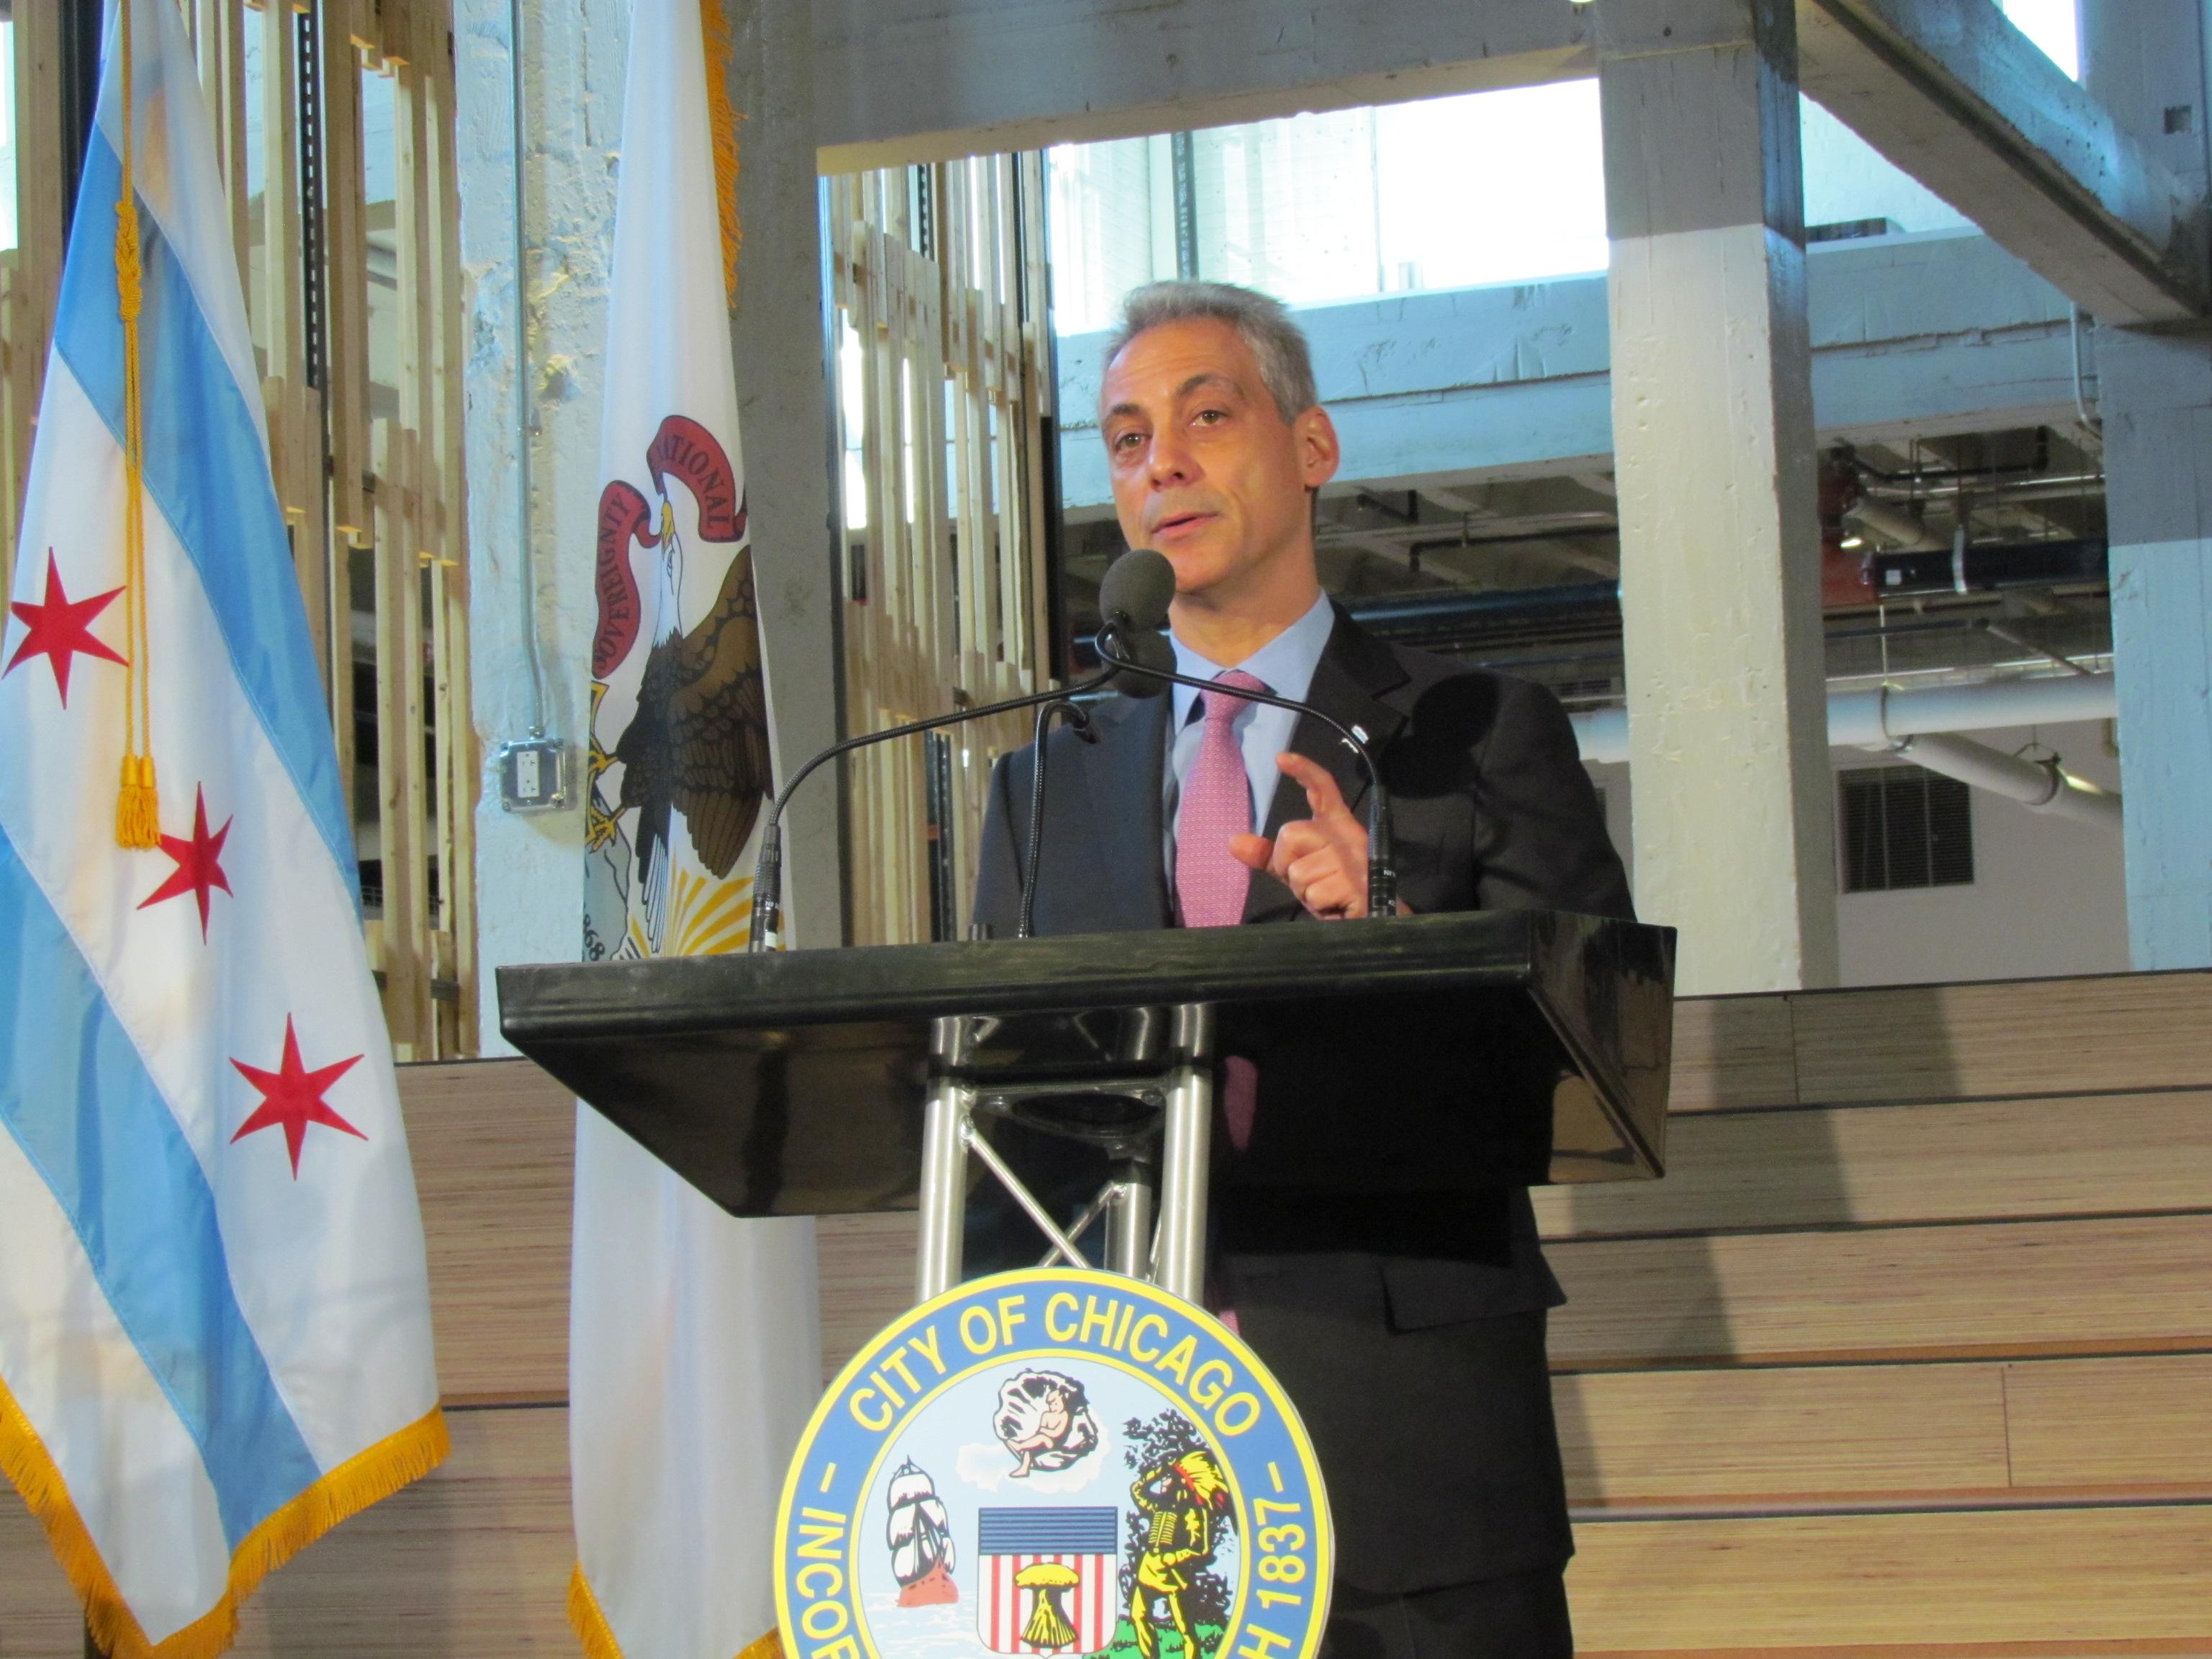 Chicago Mayor Rahm Emanuel speaking at Motorola's opening event